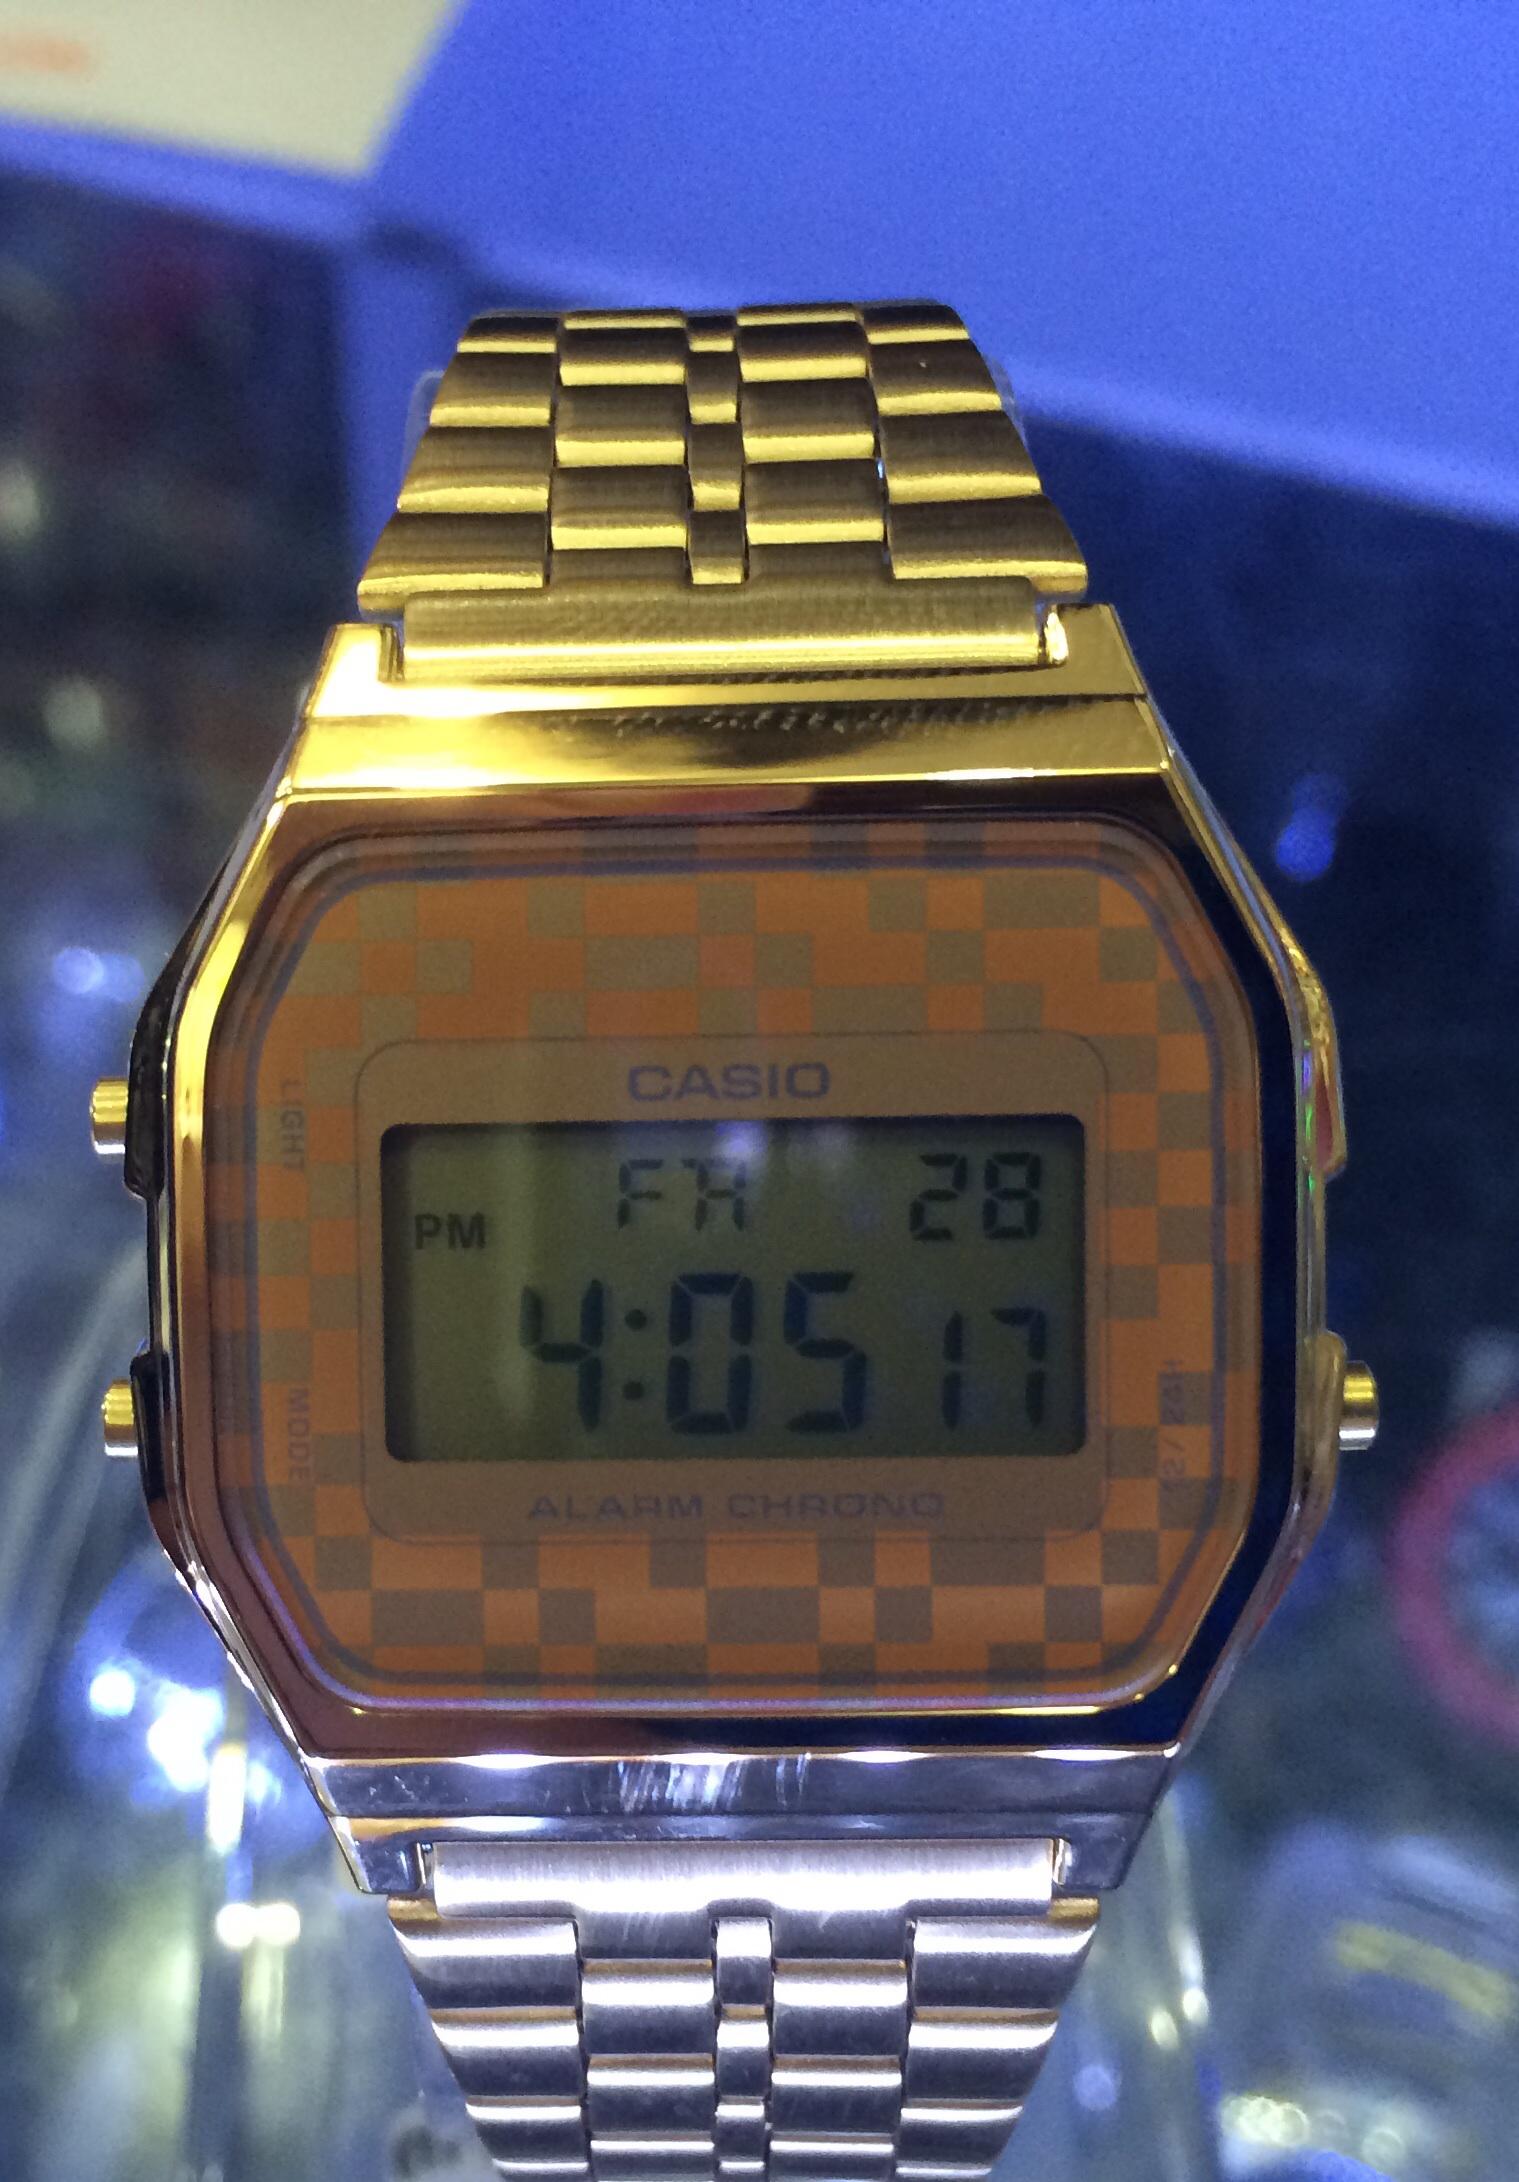 bb4fa56e8925 Reloj CASIO cuadros.40€. Modelo Retro. on Storenvy